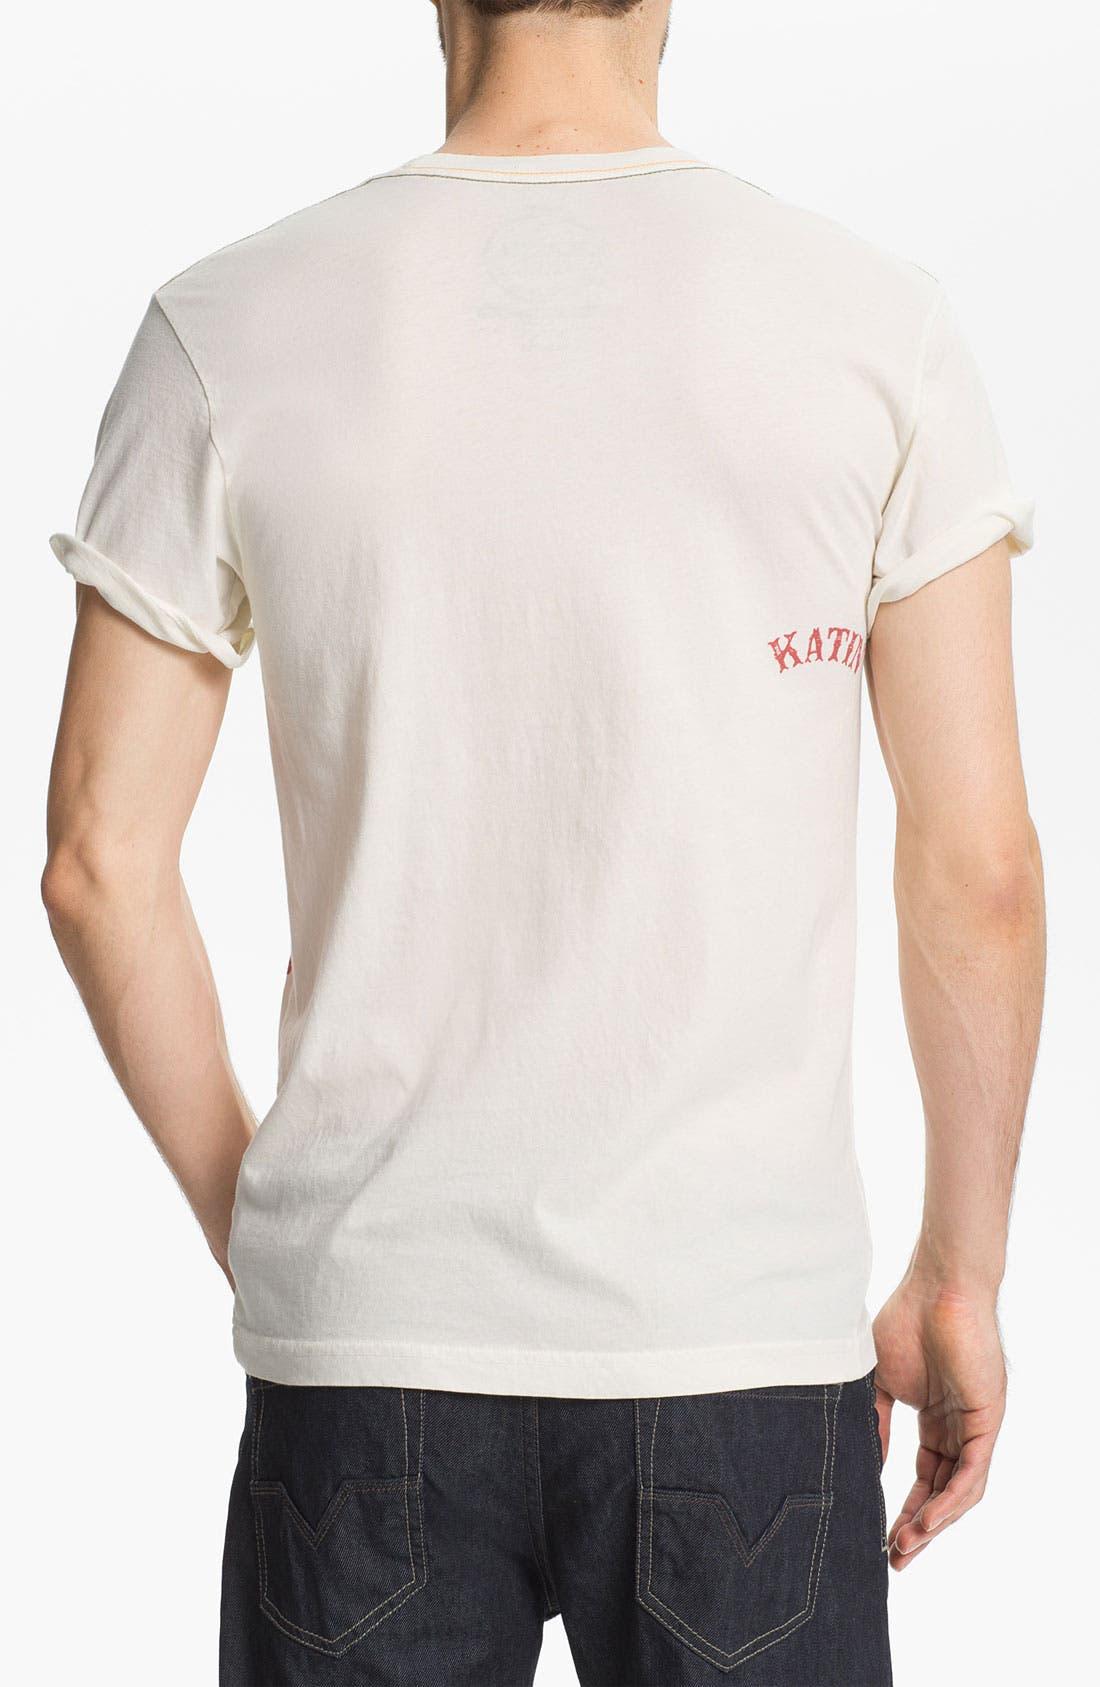 Alternate Image 2  - Katin 'Wench' Graphic T-Shirt